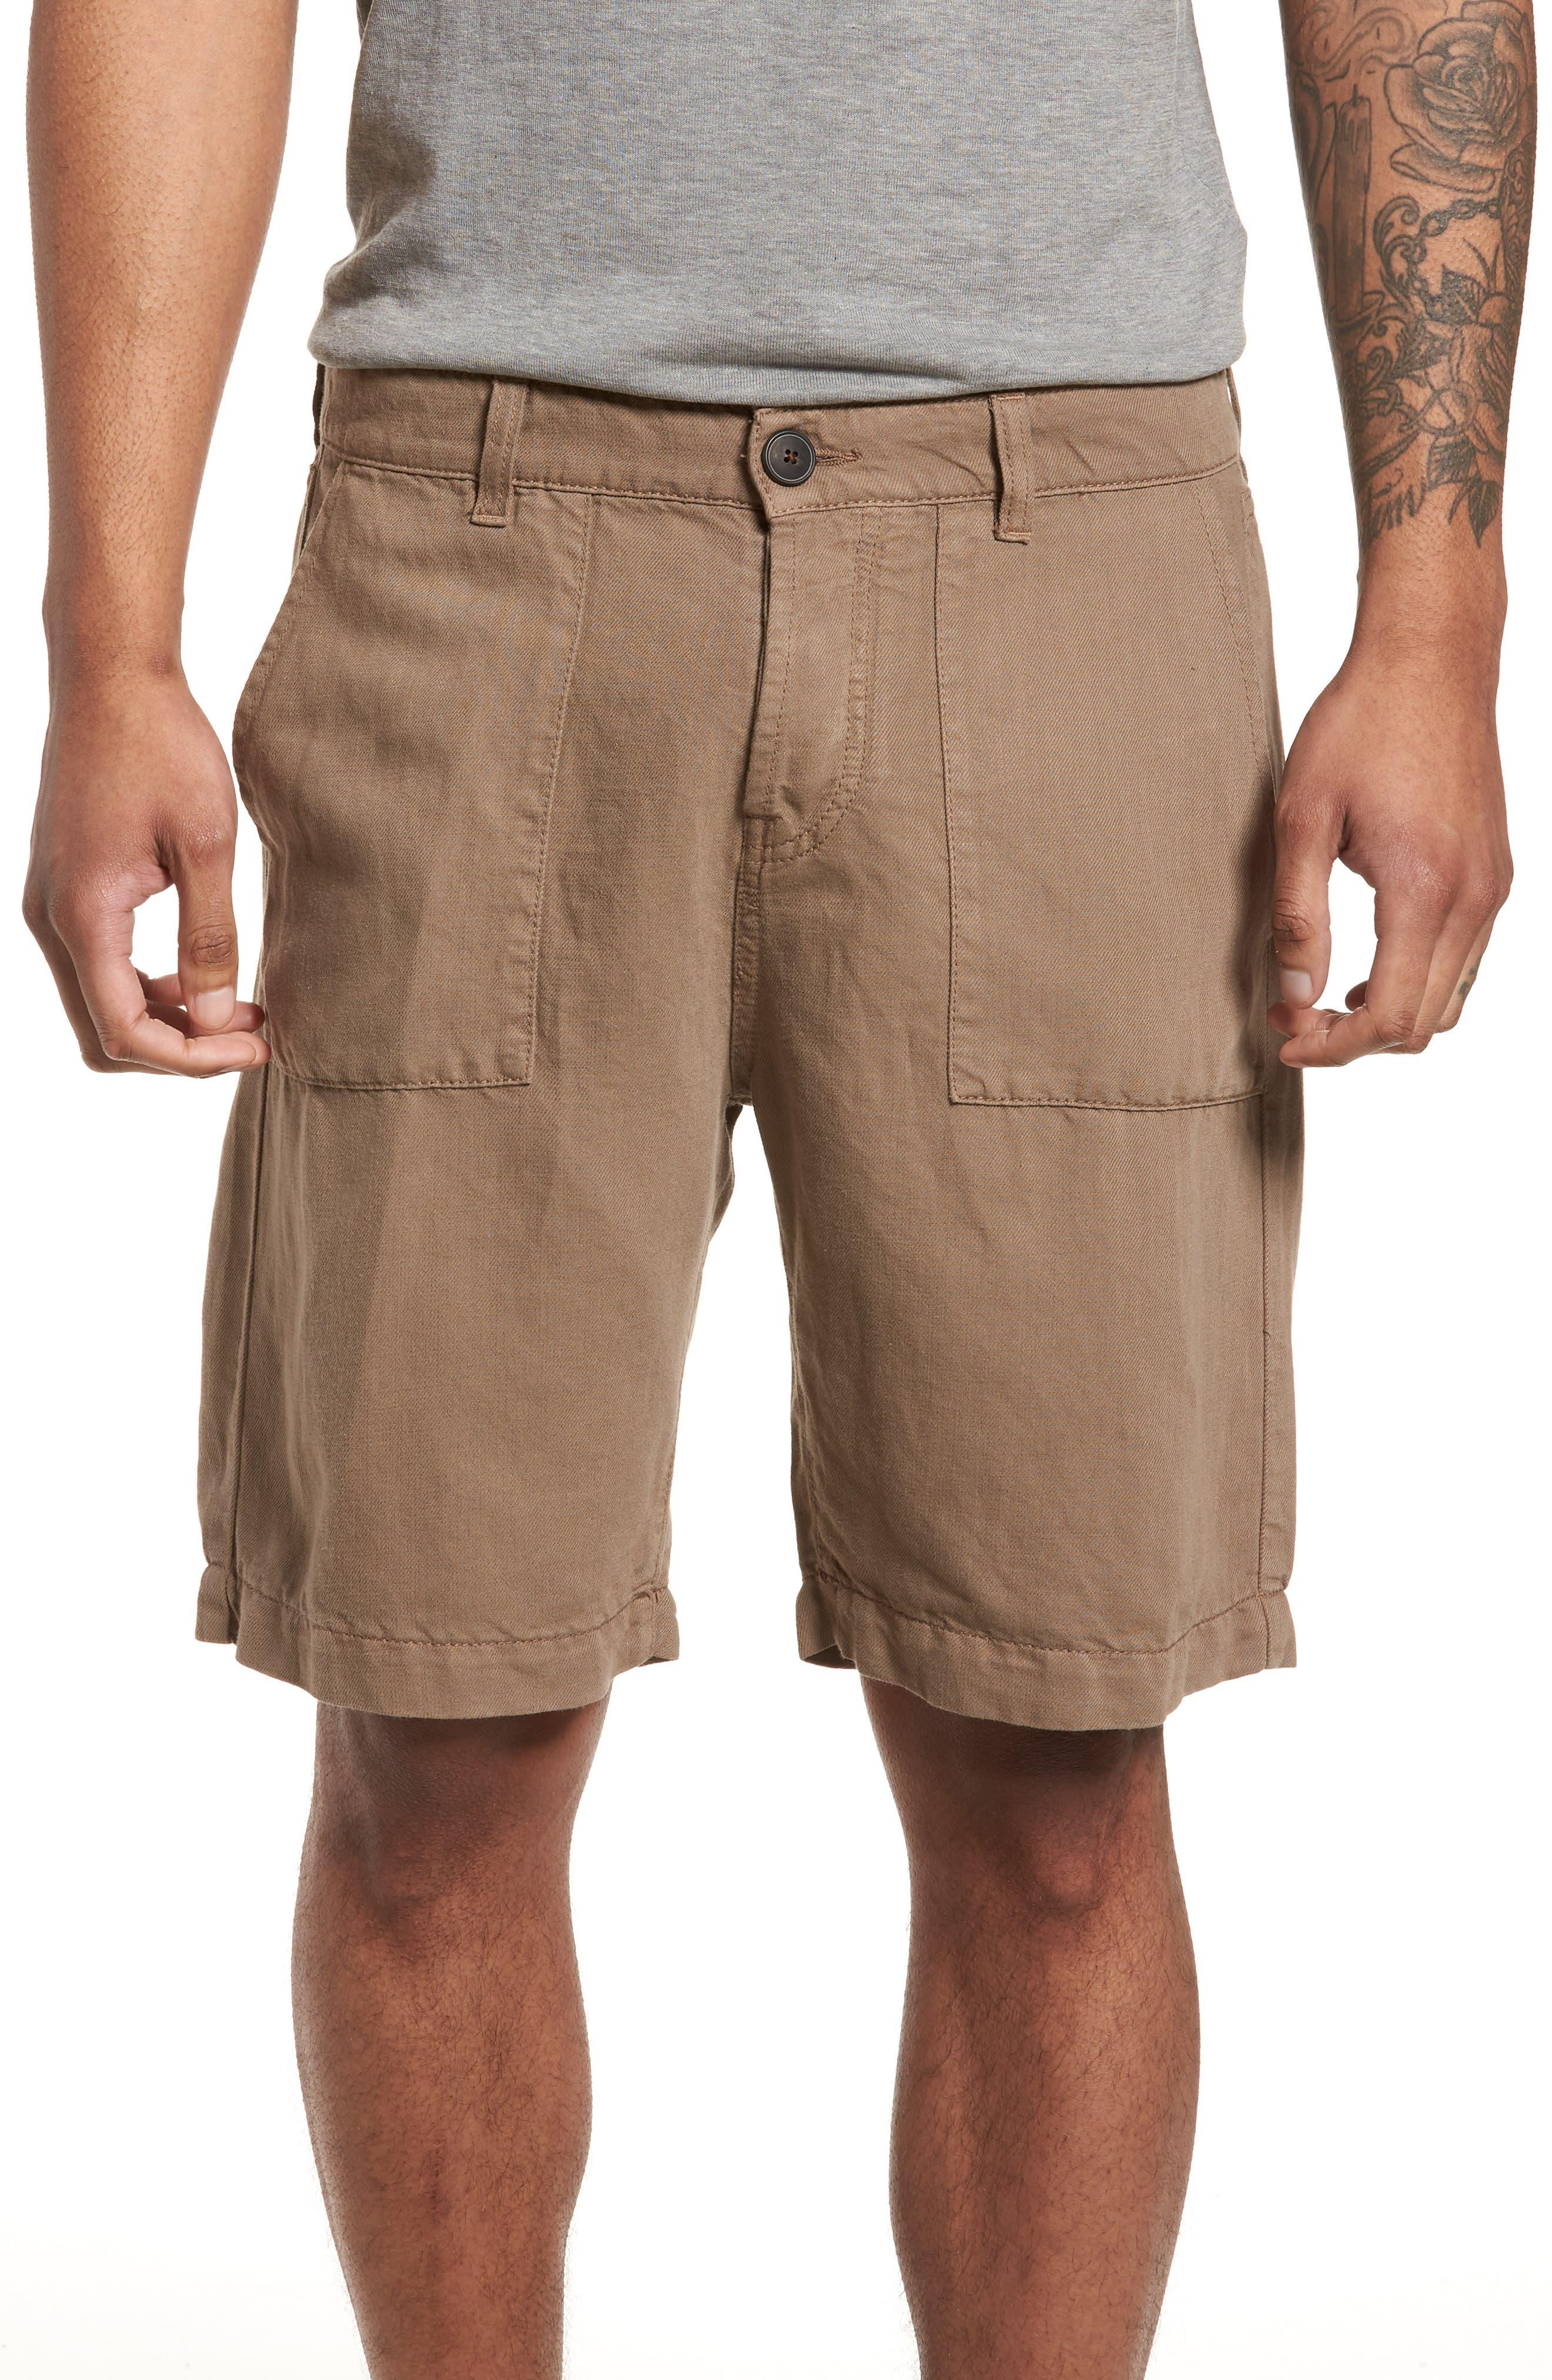 Fatique Bermuda Shorts,                         Main,                         color, Taupe